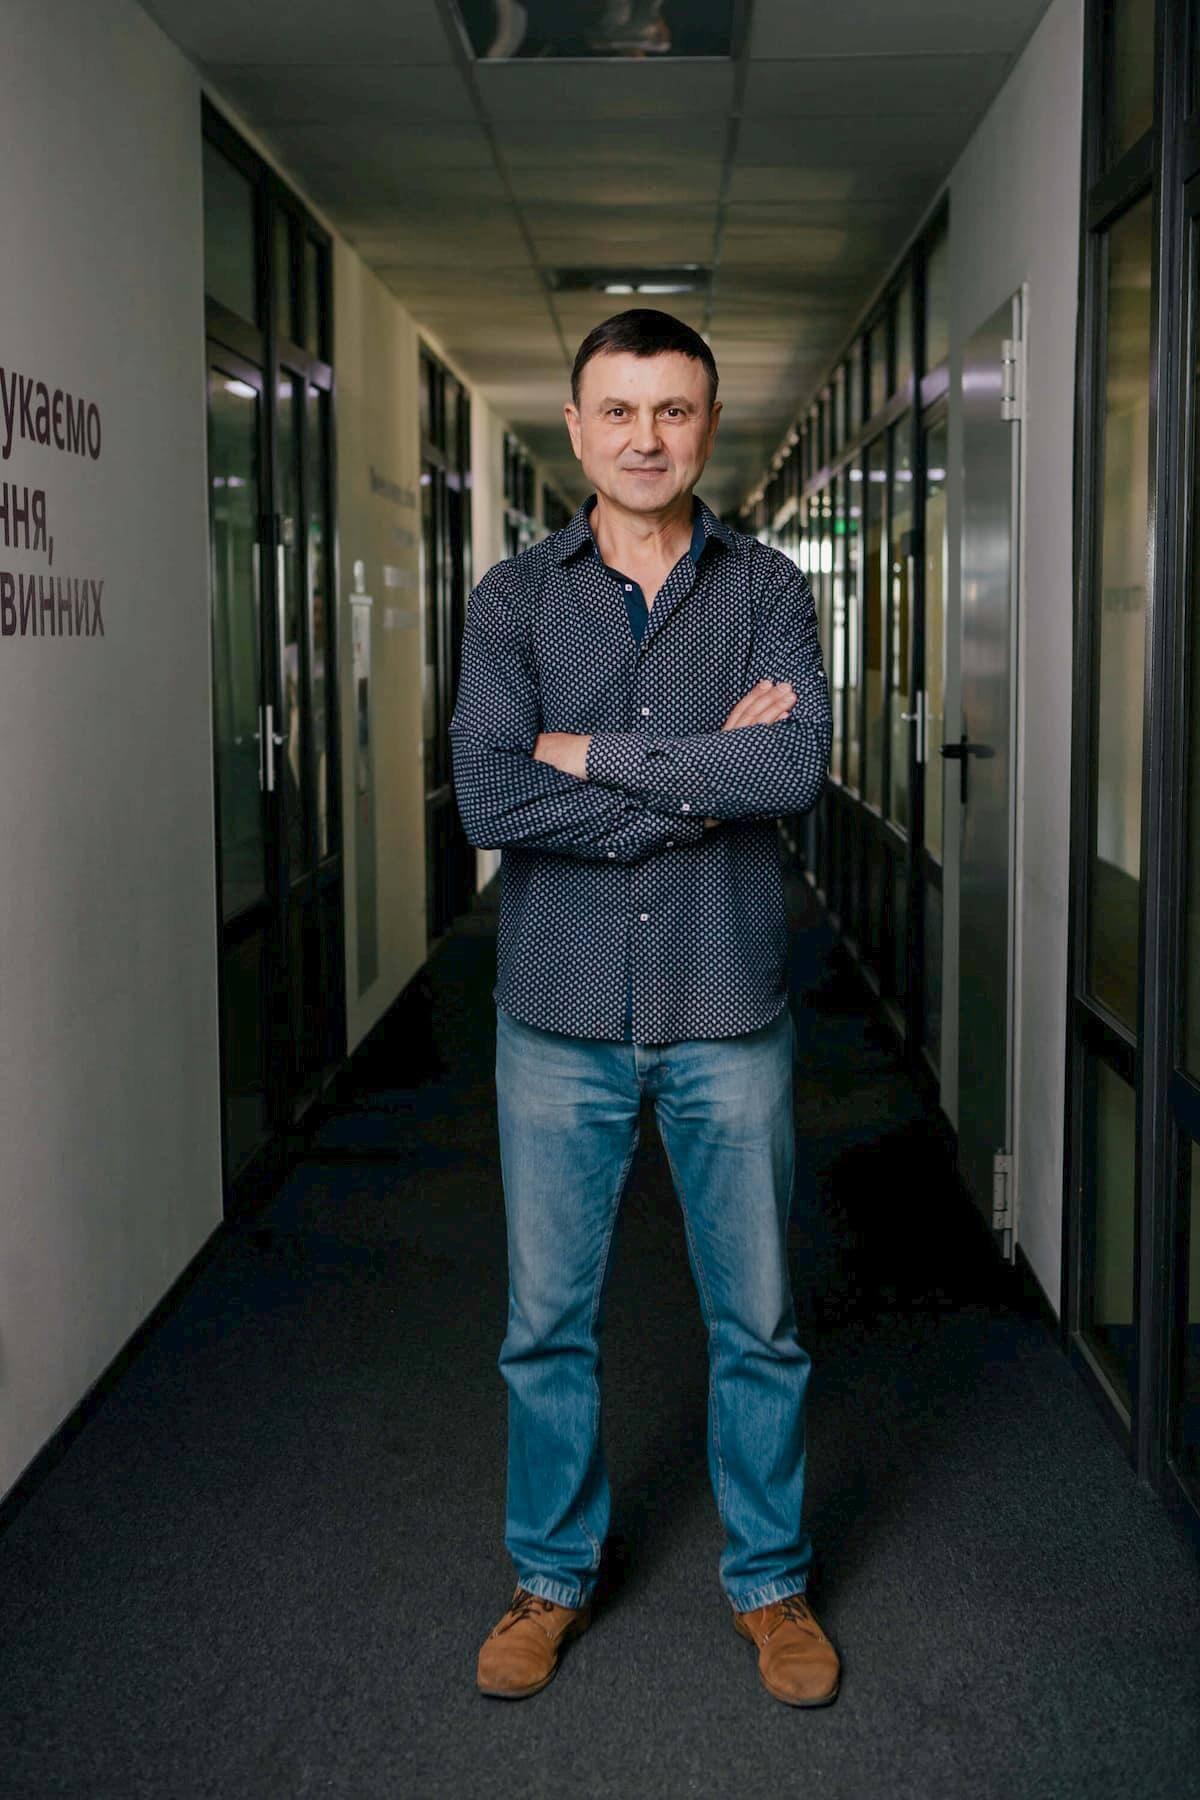 Юрий Коваленко актер озвучки интервью Телекритика